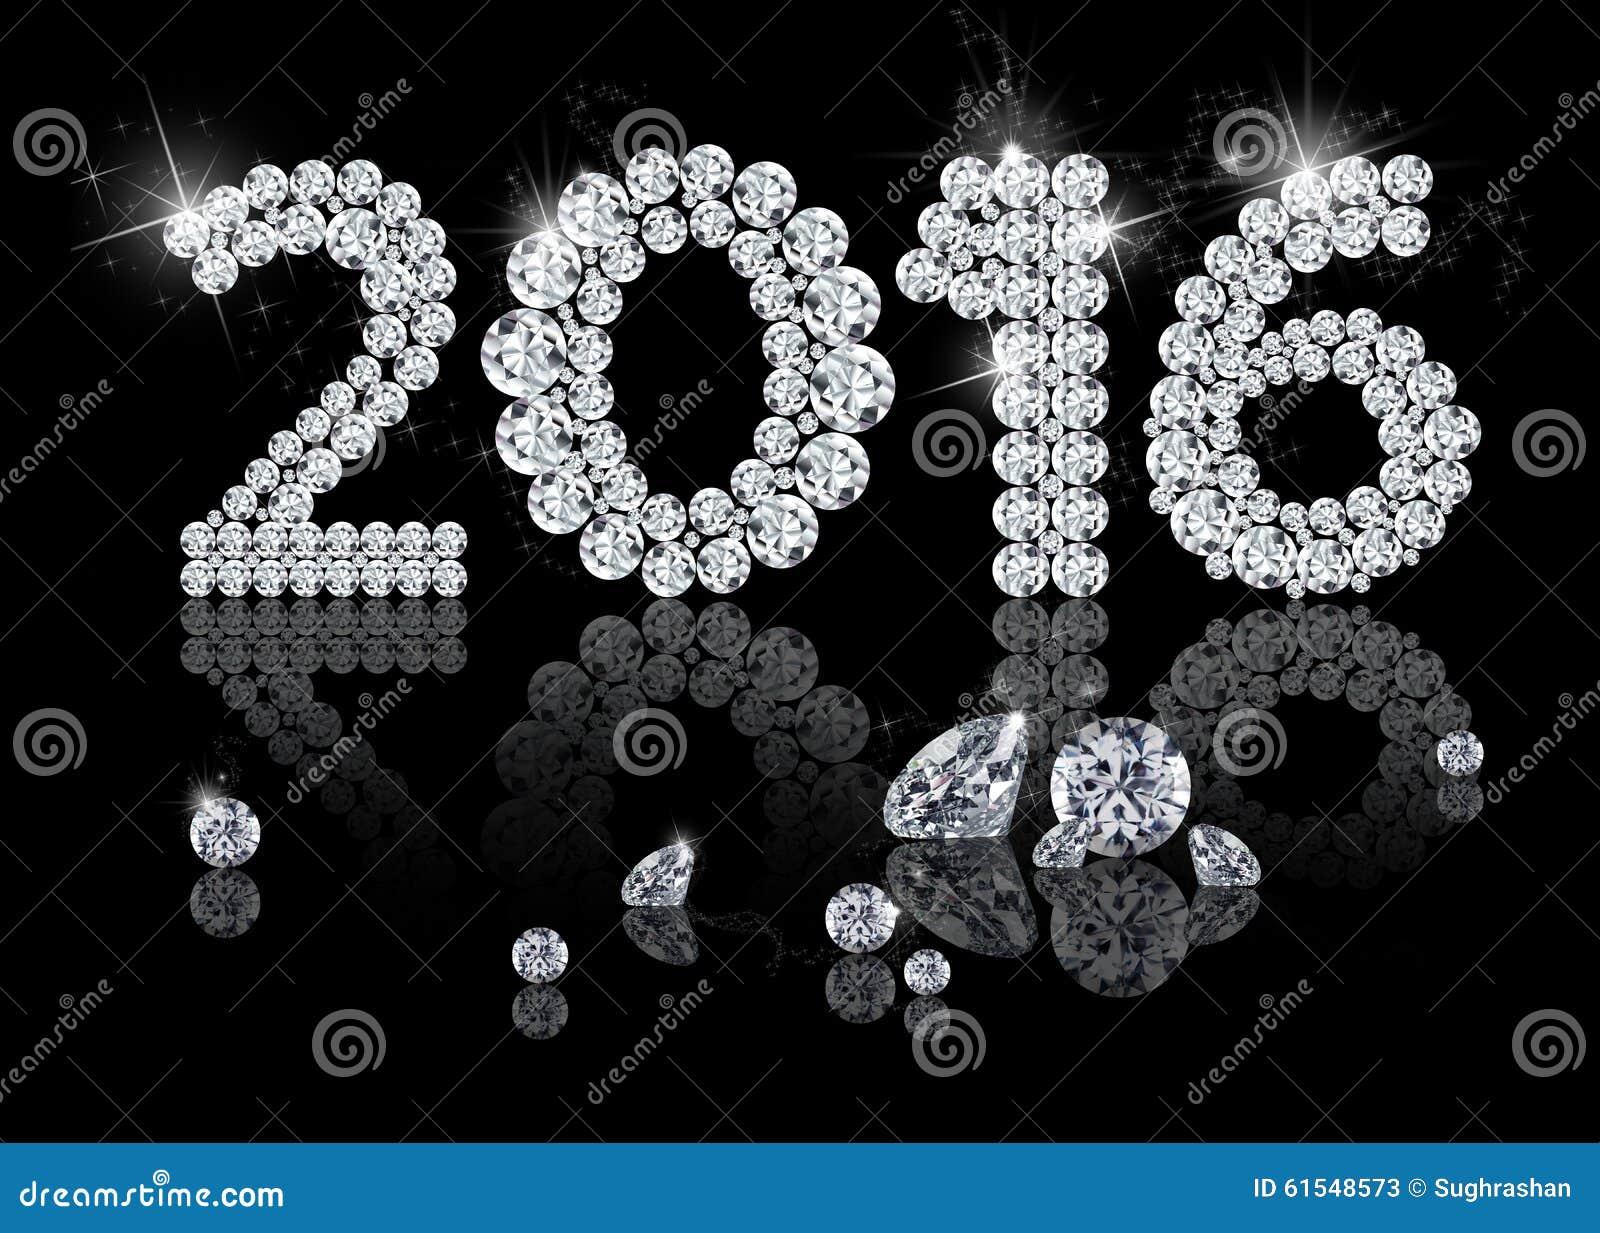 Brilliant New Year 2016 Stock Illustration Illustration